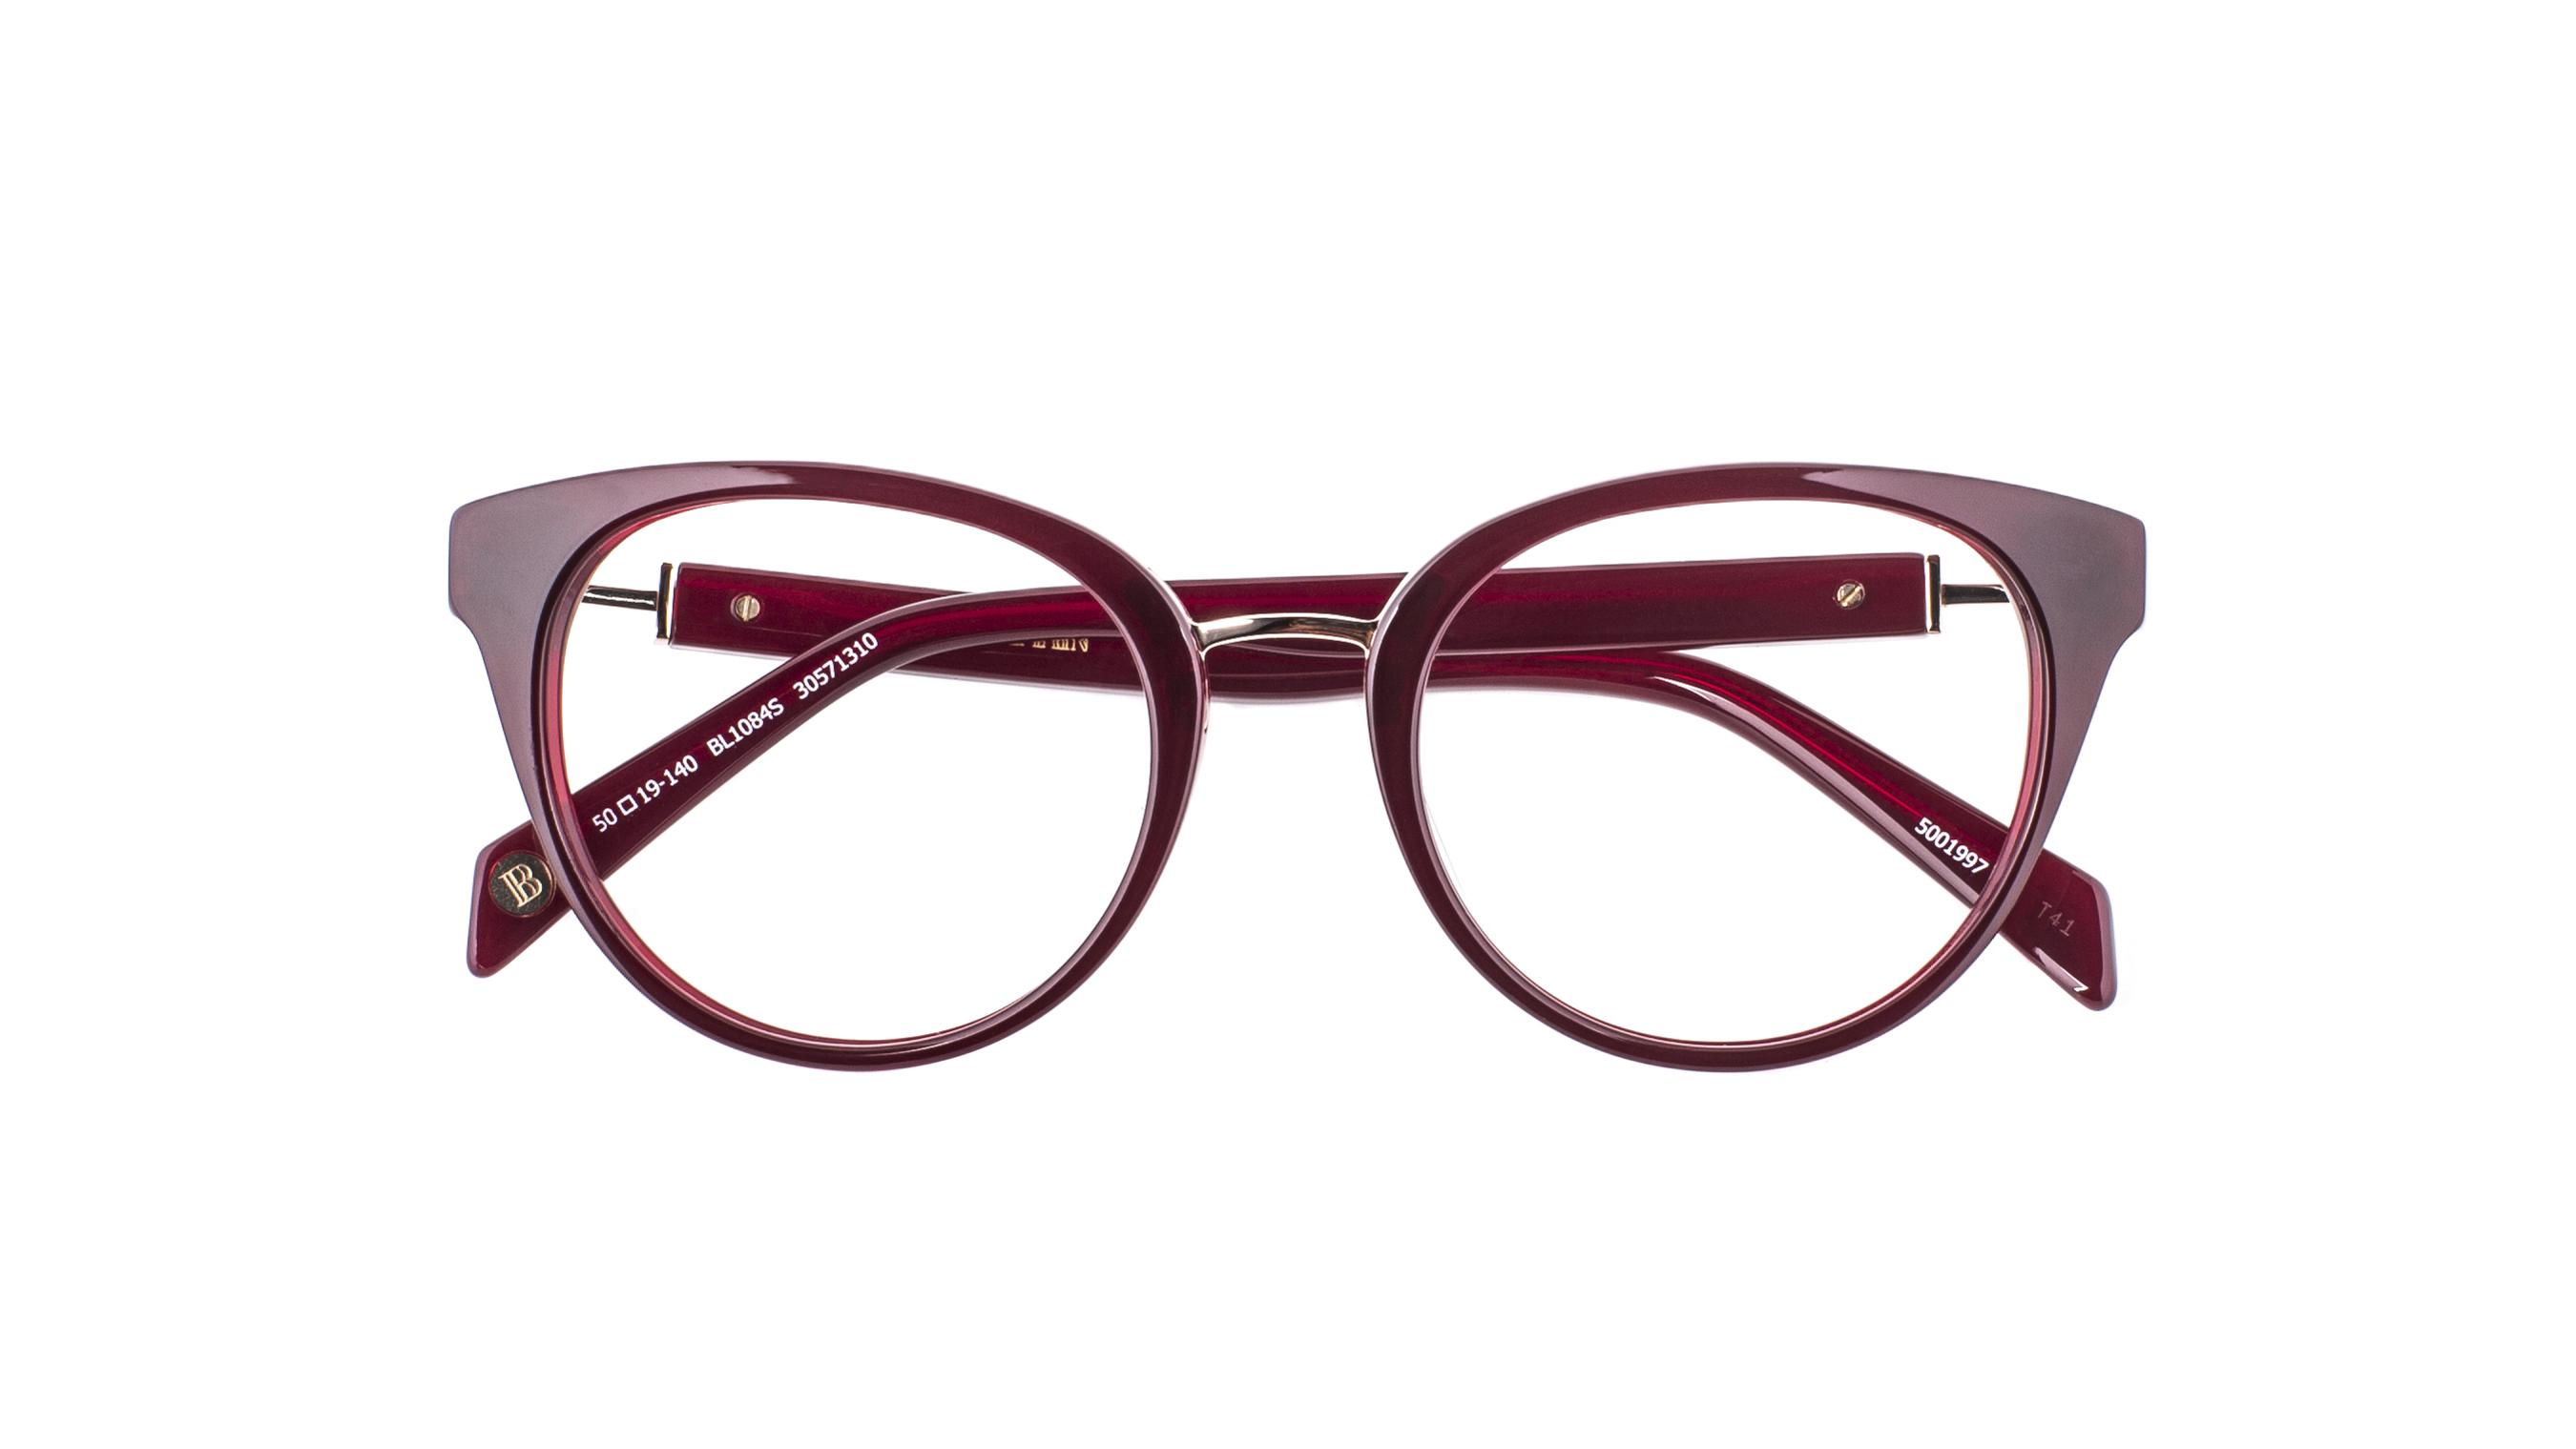 Balmain x Specsavers BL1084S 30571310 - RRP 2 pairs single vision $459 (2)